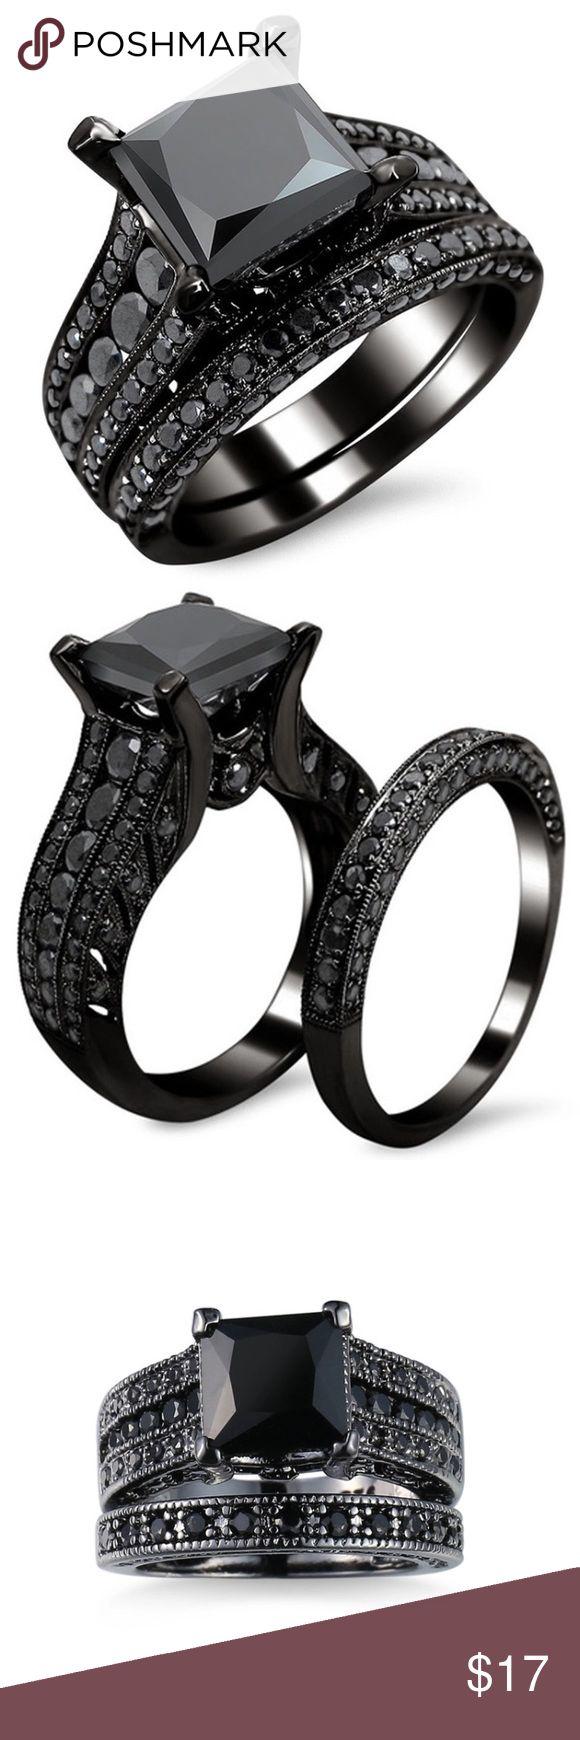 onyx engagement ring onyx wedding band Black Onyx Princess Engagement Wedding Ring Set Beautiful sleek Ring set Larger black princess cut